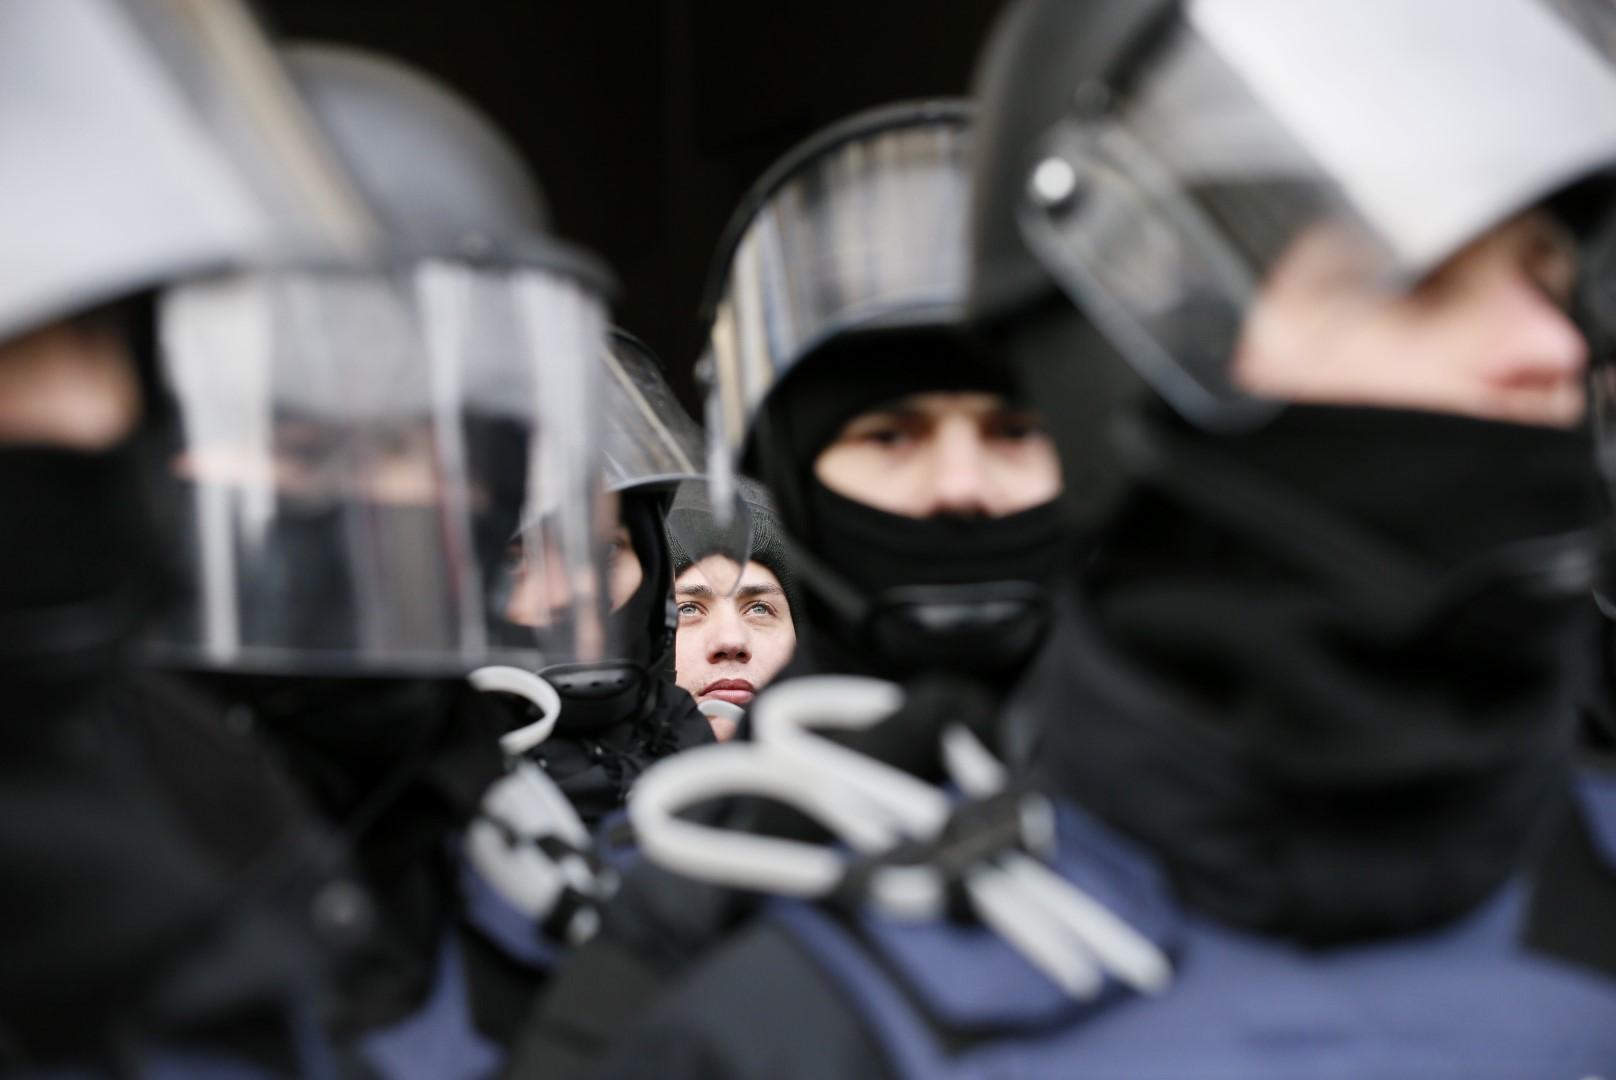 Riot police officers stand guard during a protest of Ukrainian opposition figure and Georgian former President Mikheil Saakashvili's supporters in Kiev, Ukraine December 11, 2017. REUTERS/Gleb Garanich - UP1EDCB0UR80H